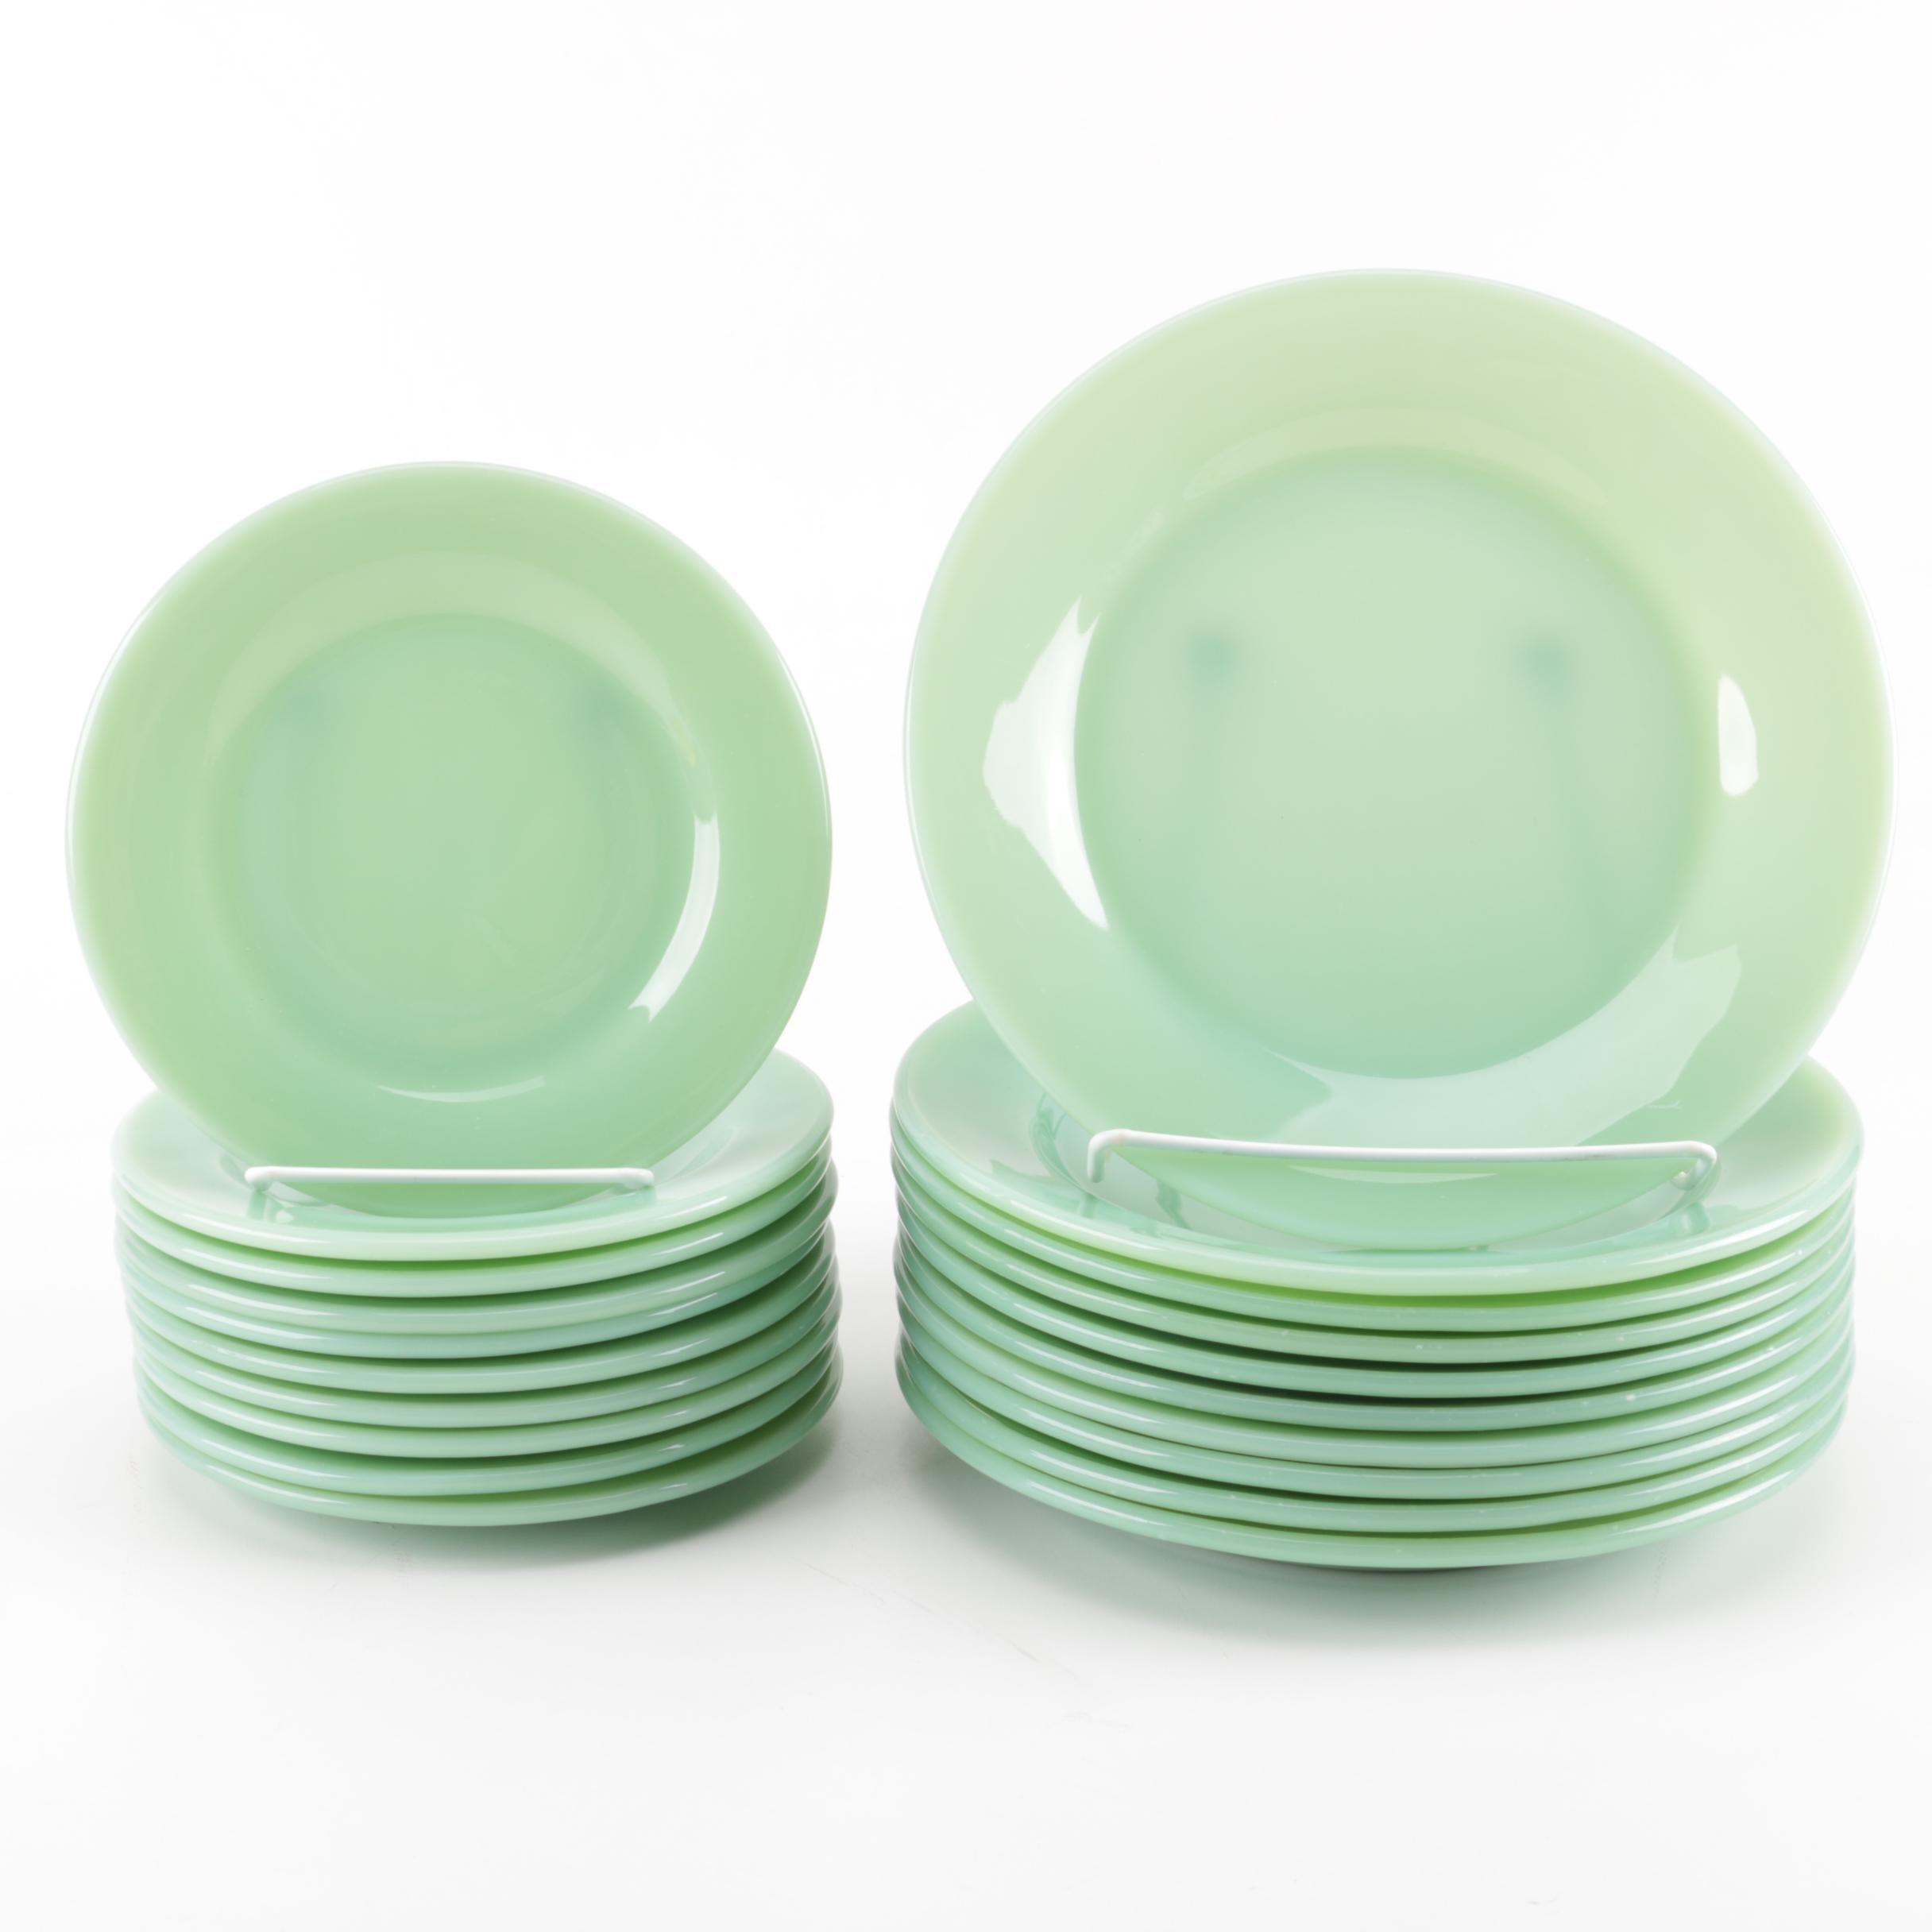 Fire-King Jadeite Dinner and Salad Plates ...  sc 1 st  EBTH.com & Fire-King Jadeite Dinner and Salad Plates : EBTH